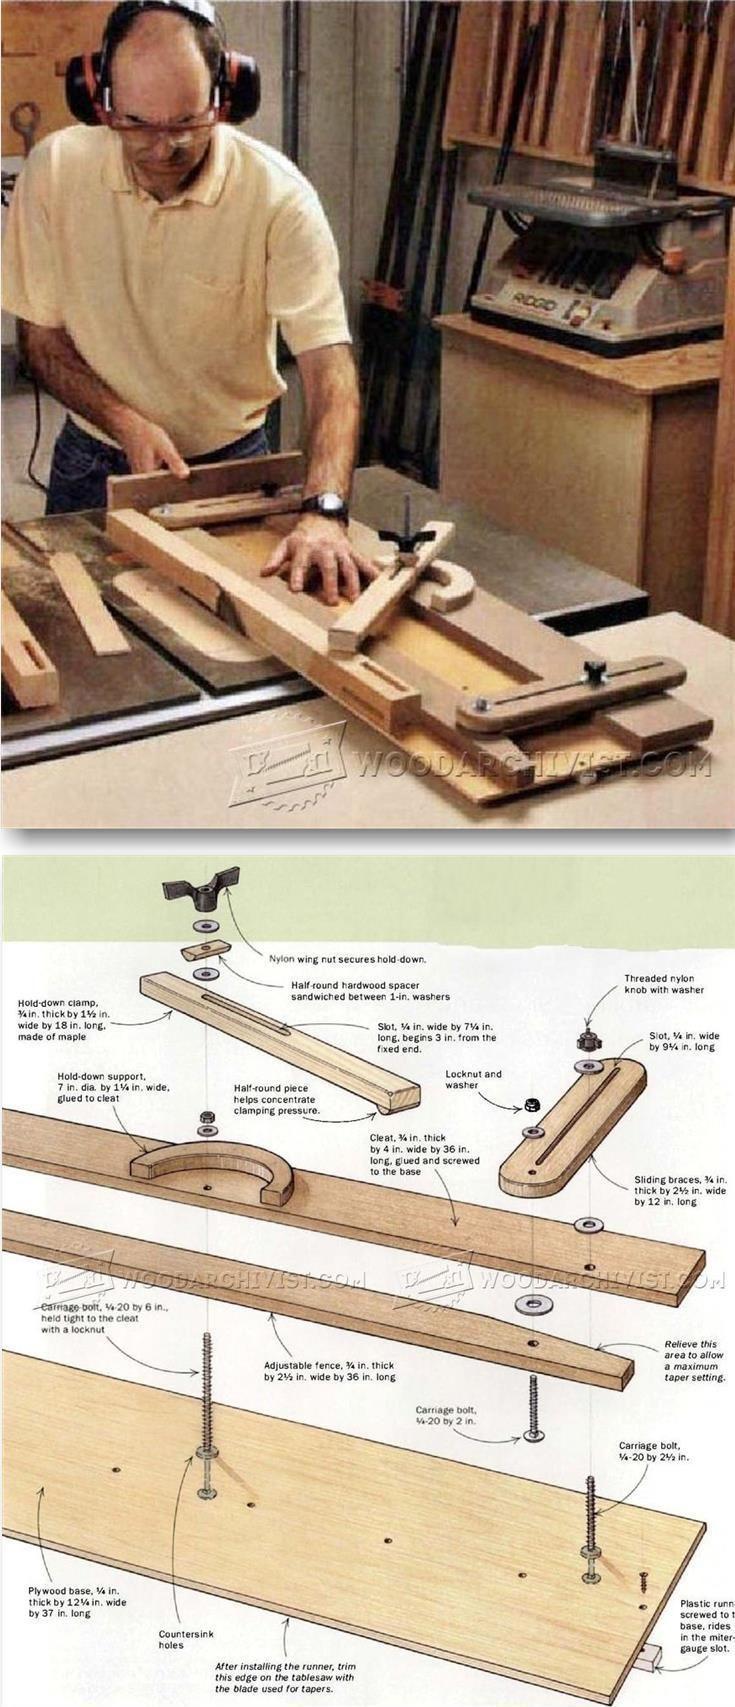 Tapering Jig Plans - Furniture Leg Construction | WoodArchivist.com #WoodworkingTools